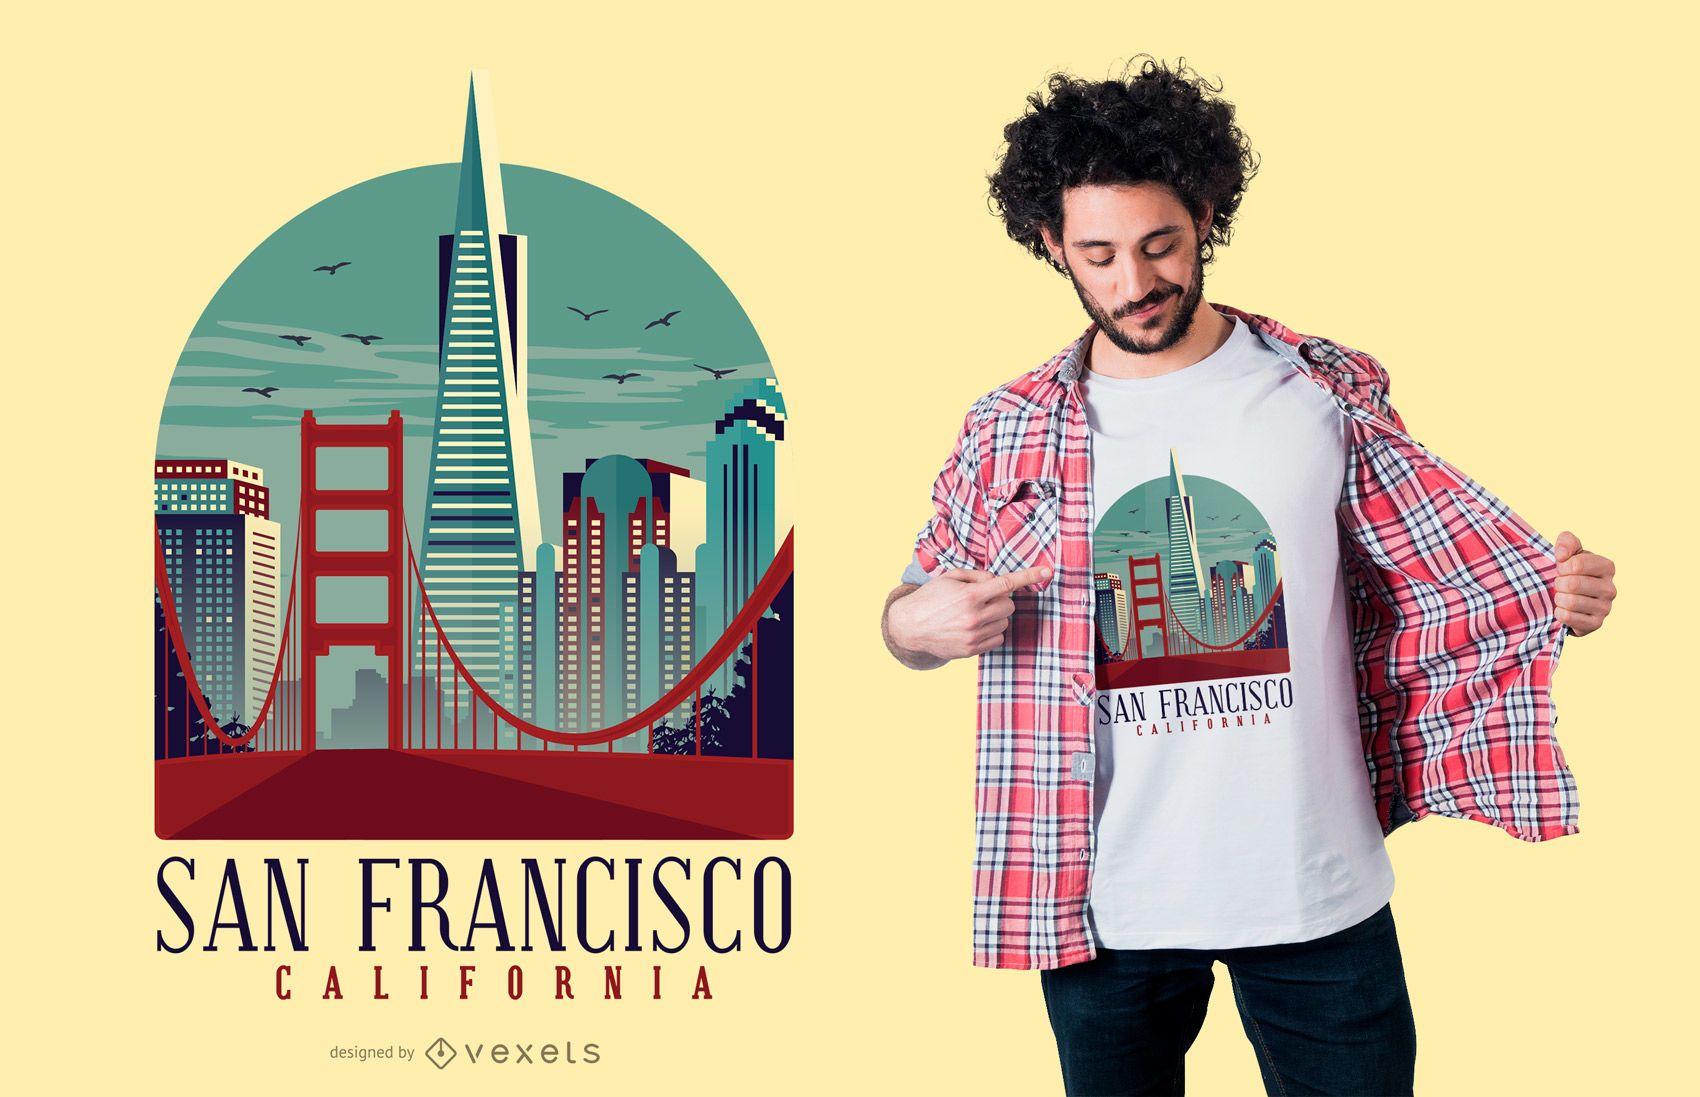 San Francisco California t-shirt design